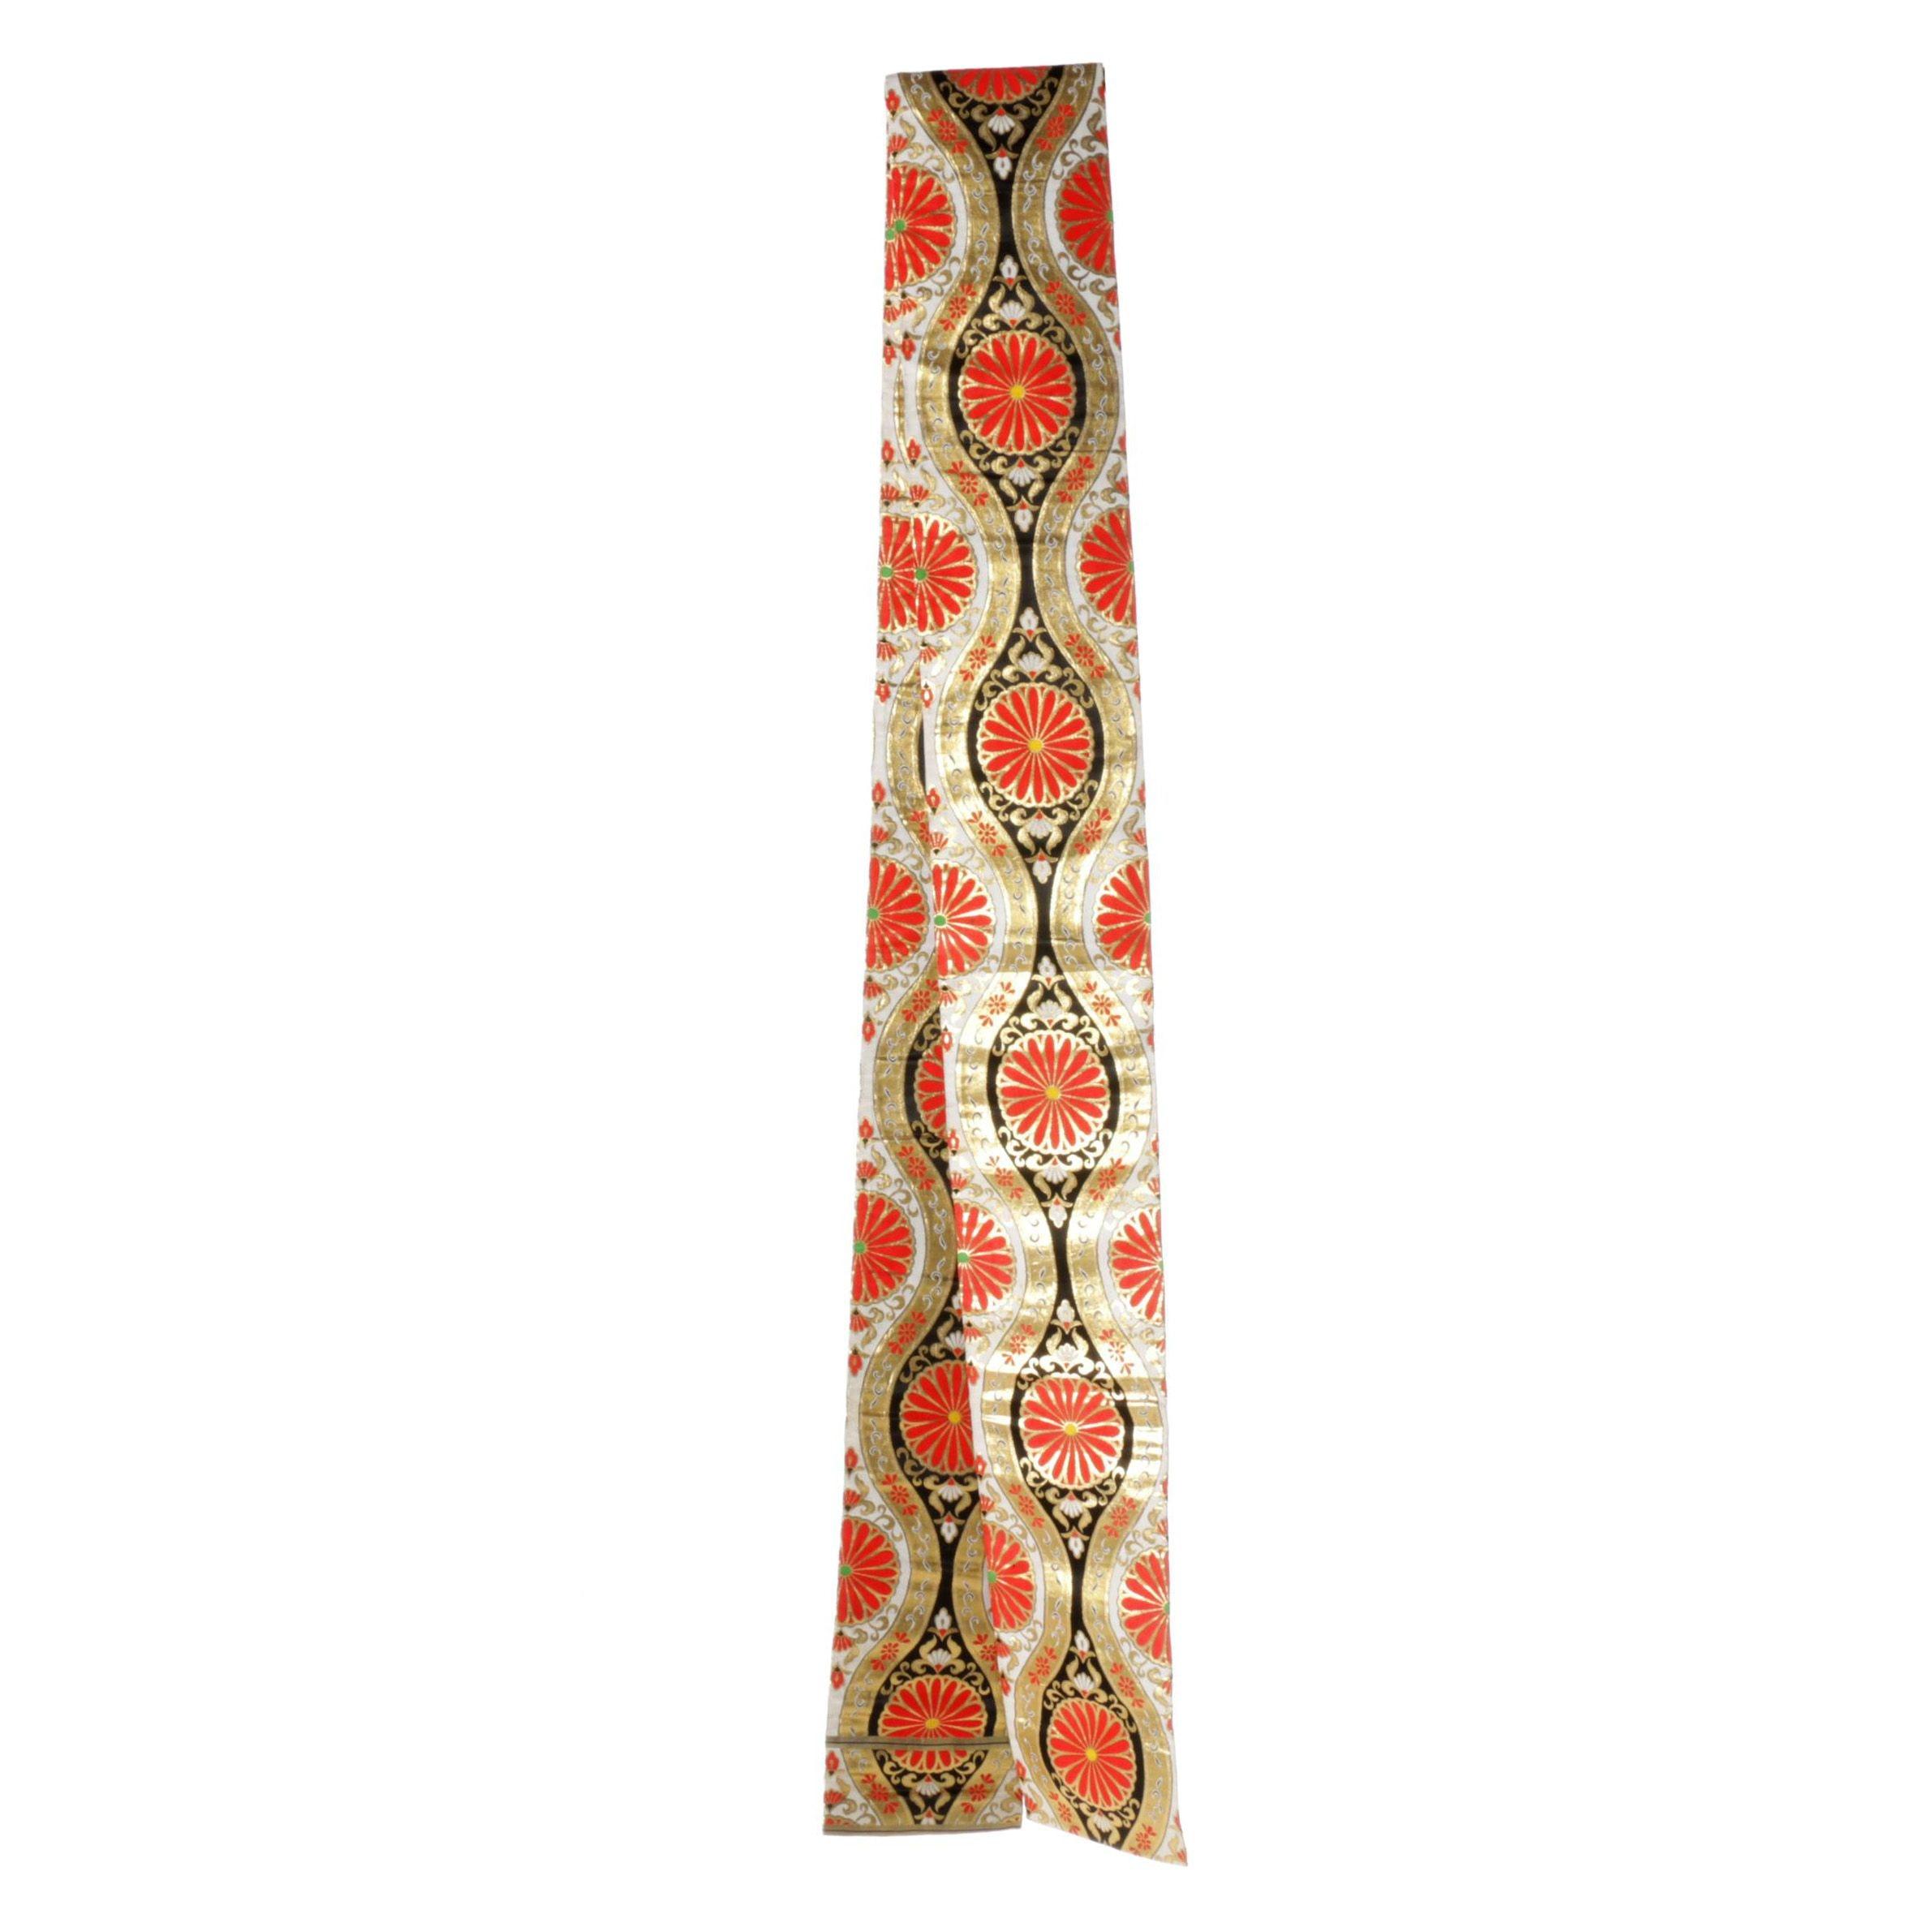 Circa 1940s Vintage Hand Sewn Silk Maru Obi